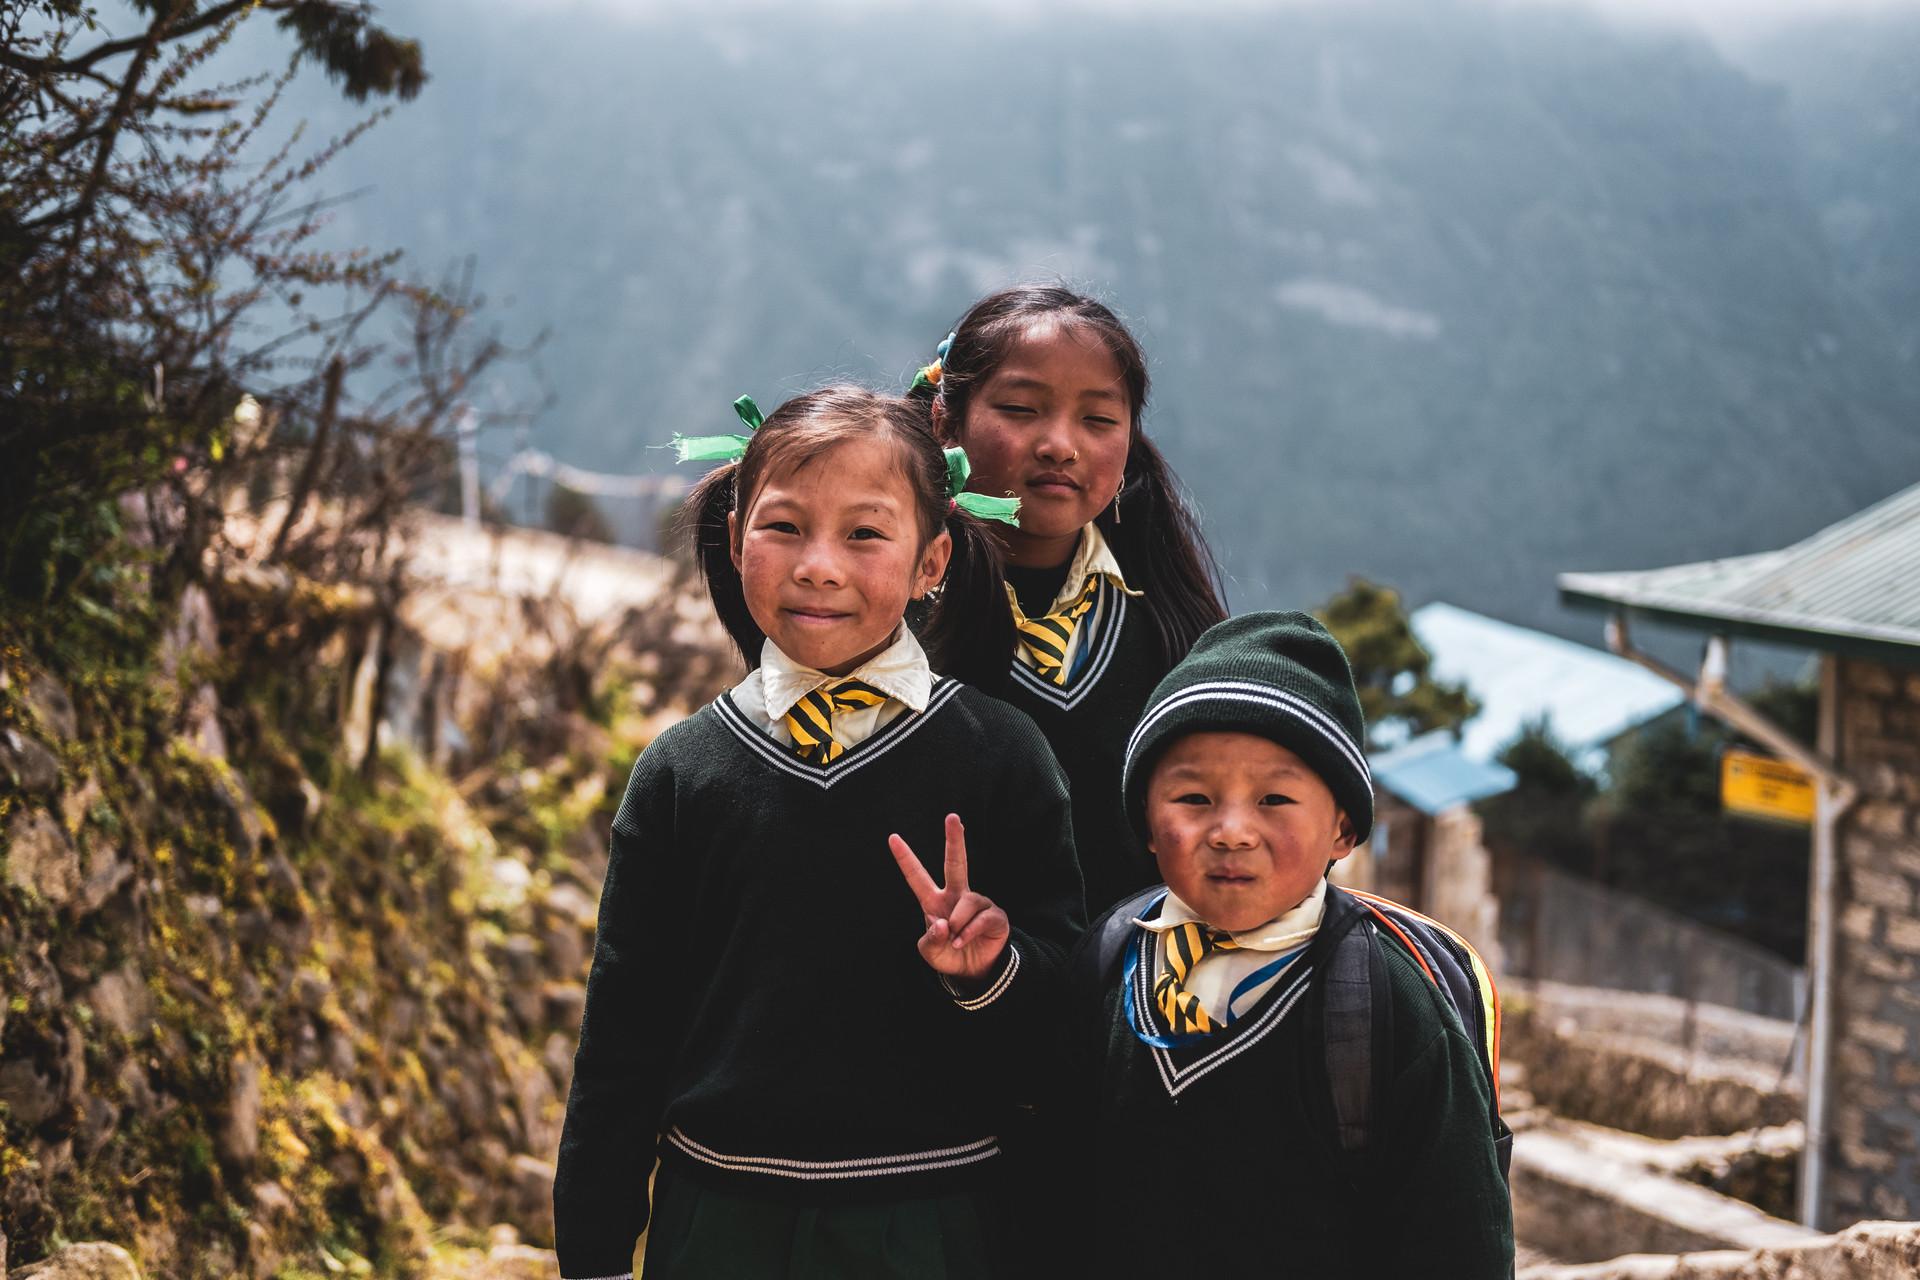 nepal_port-119990.jpg